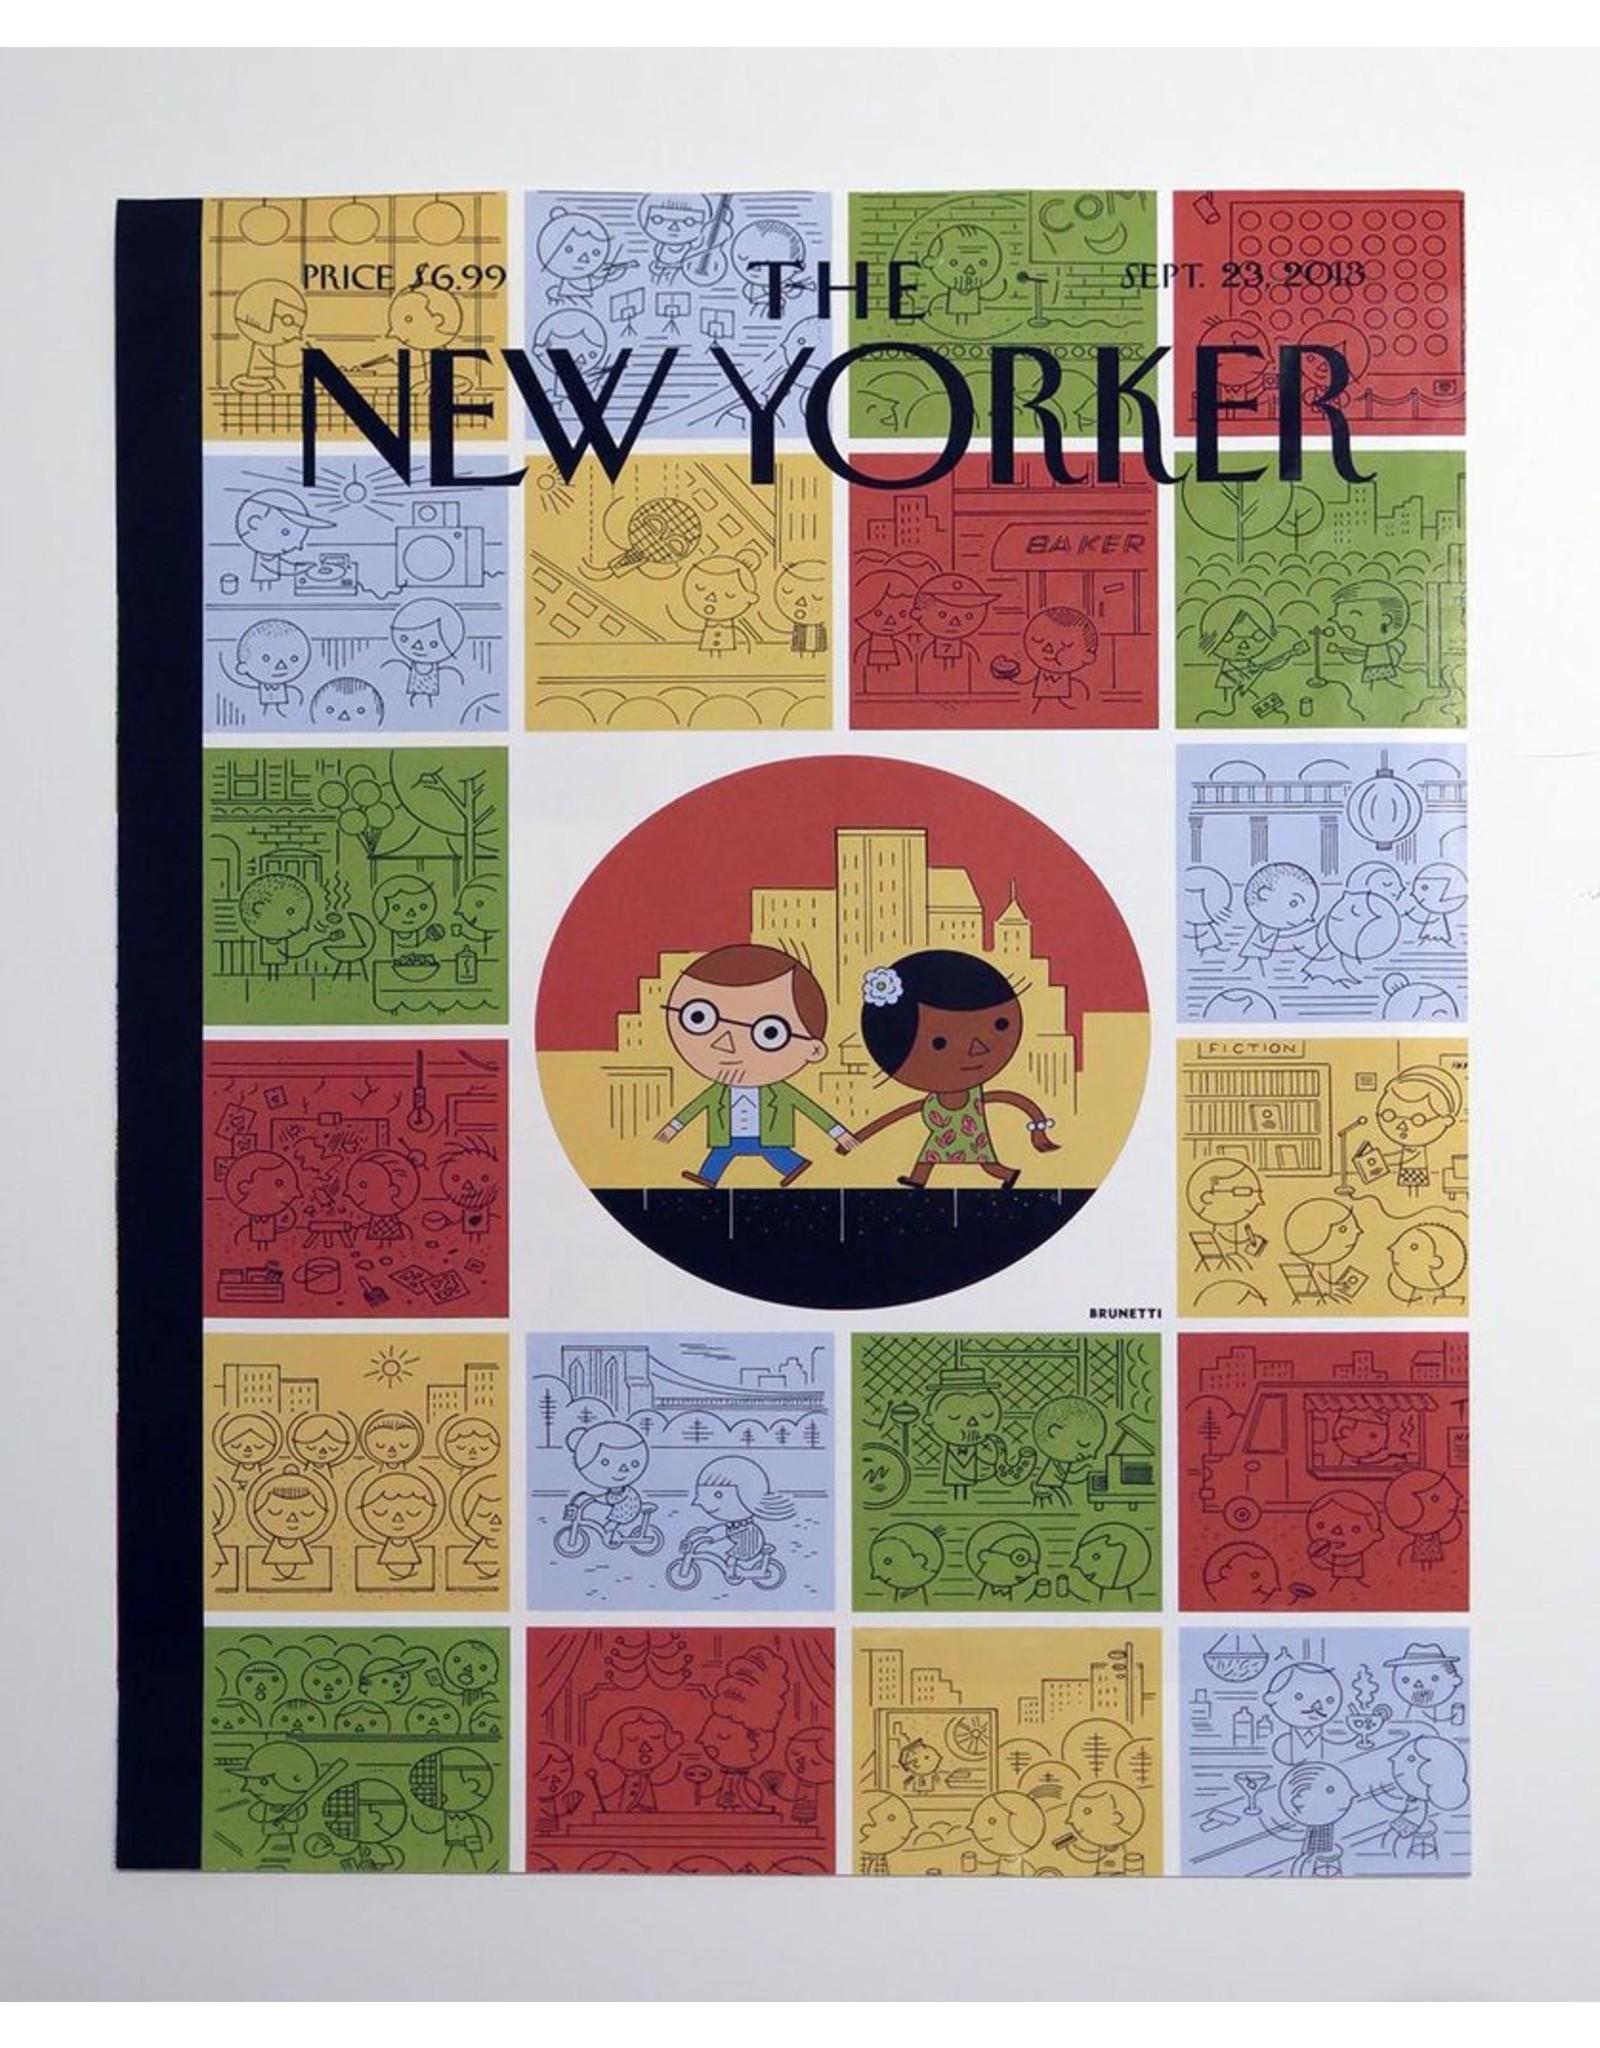 Ivan Brunetti Biking, Illustration by Ivan Brunetti for the New Yorker, Goings On About Town, September 12, 2013